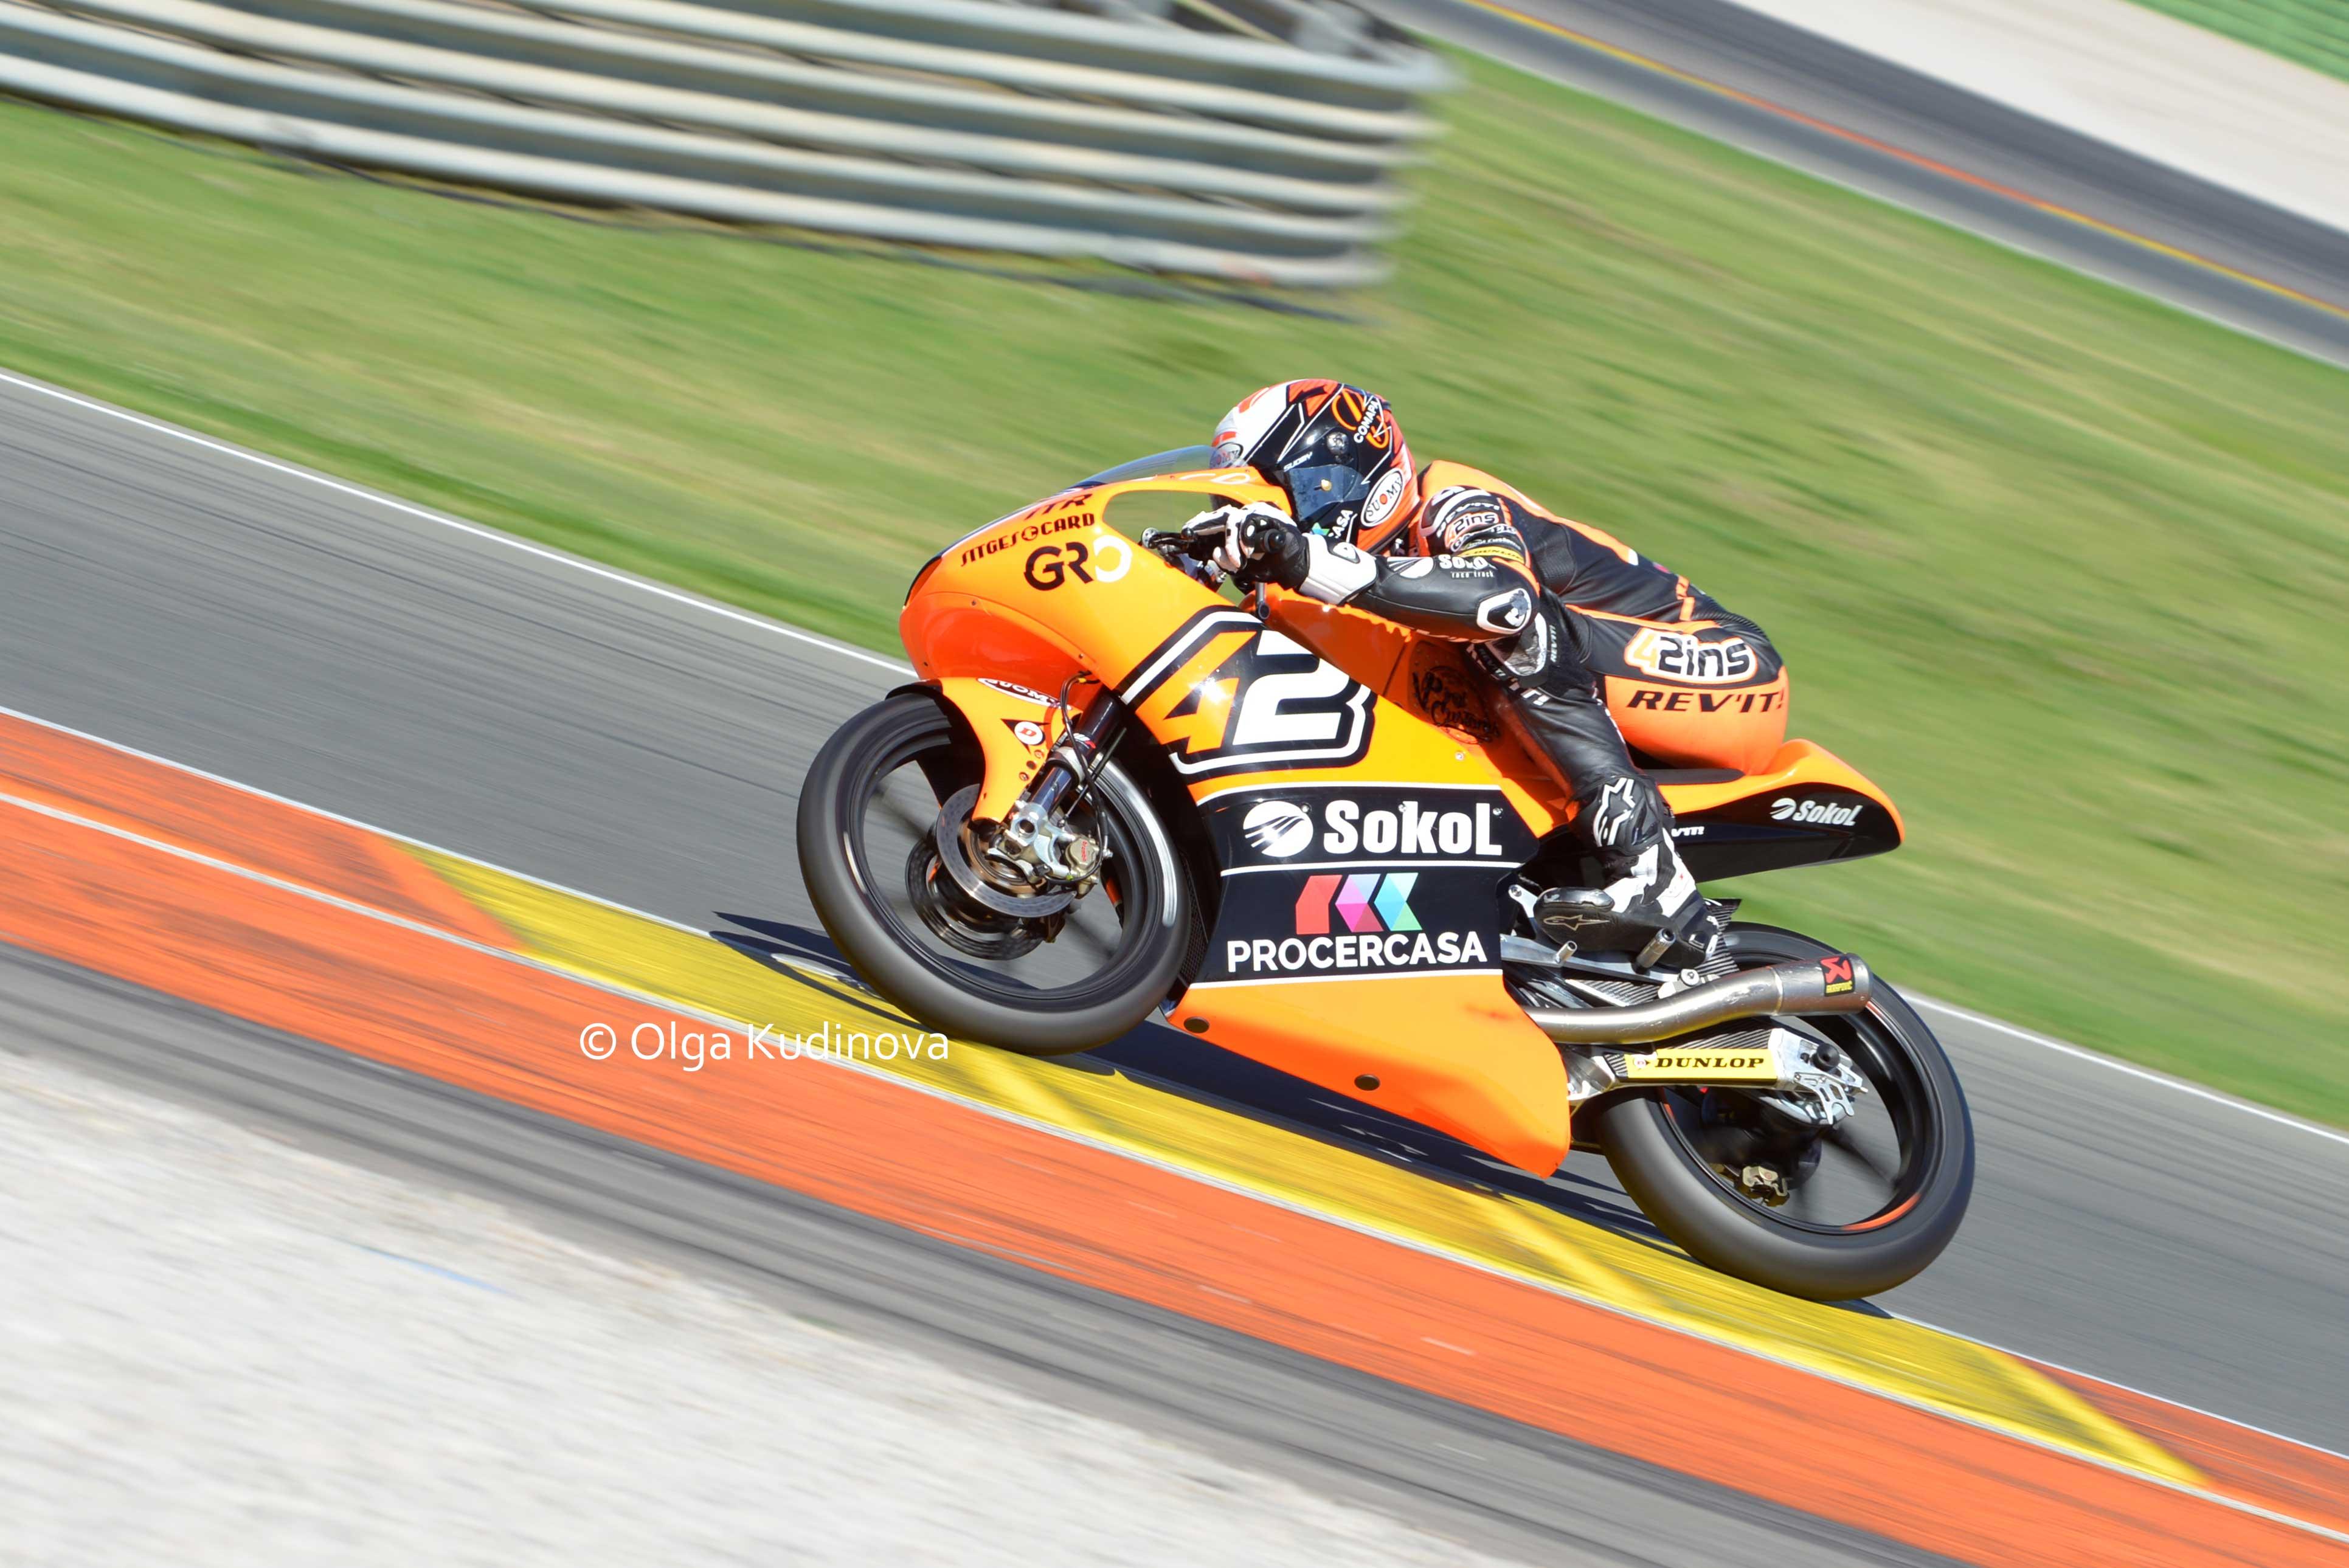 Makar Yurchenko 42 Motorsport Alex Rins / Макар Юрченко, мотоцикл ктм